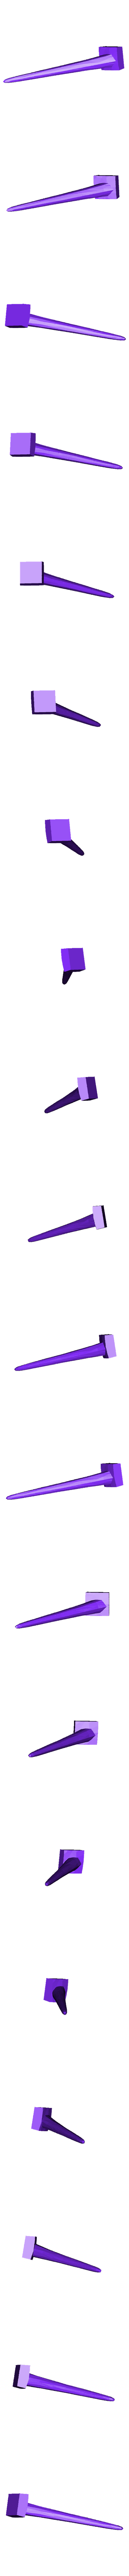 Meowth_whisker_6.obj Download free OBJ file Life-Sized Meowth • 3D print model, JayOmega